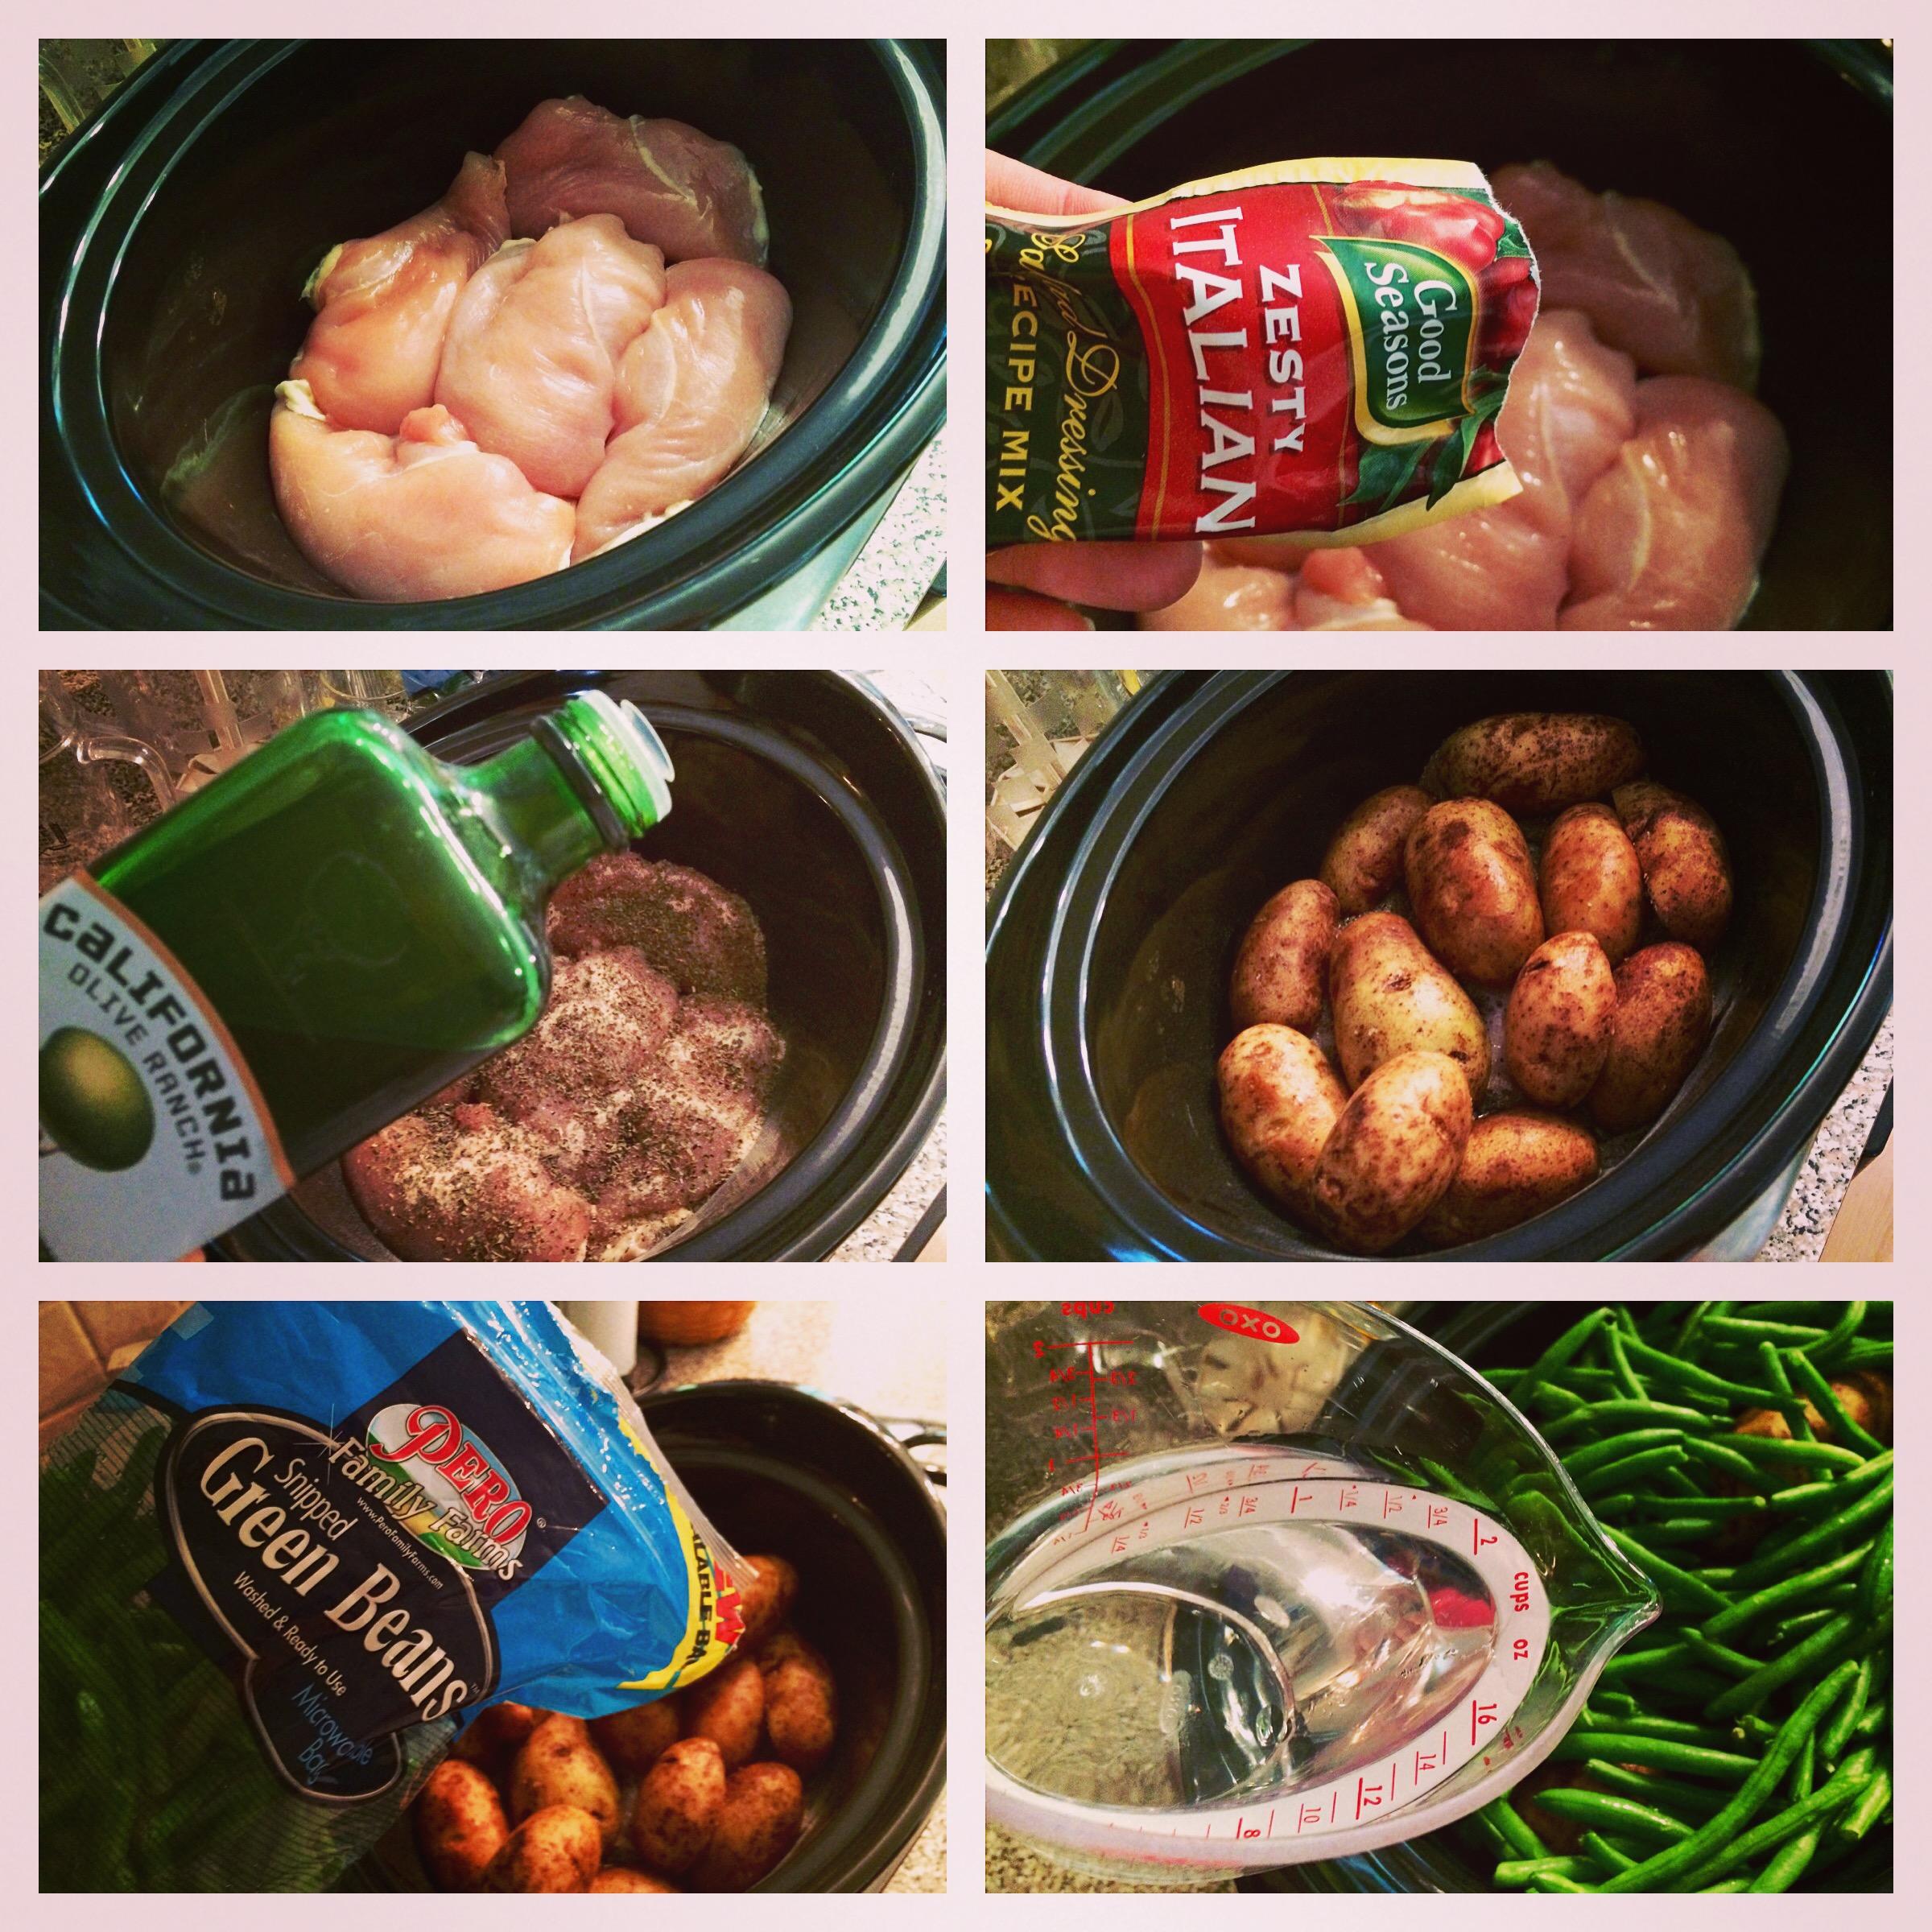 Crock pot recipes chicken breast and potatoes